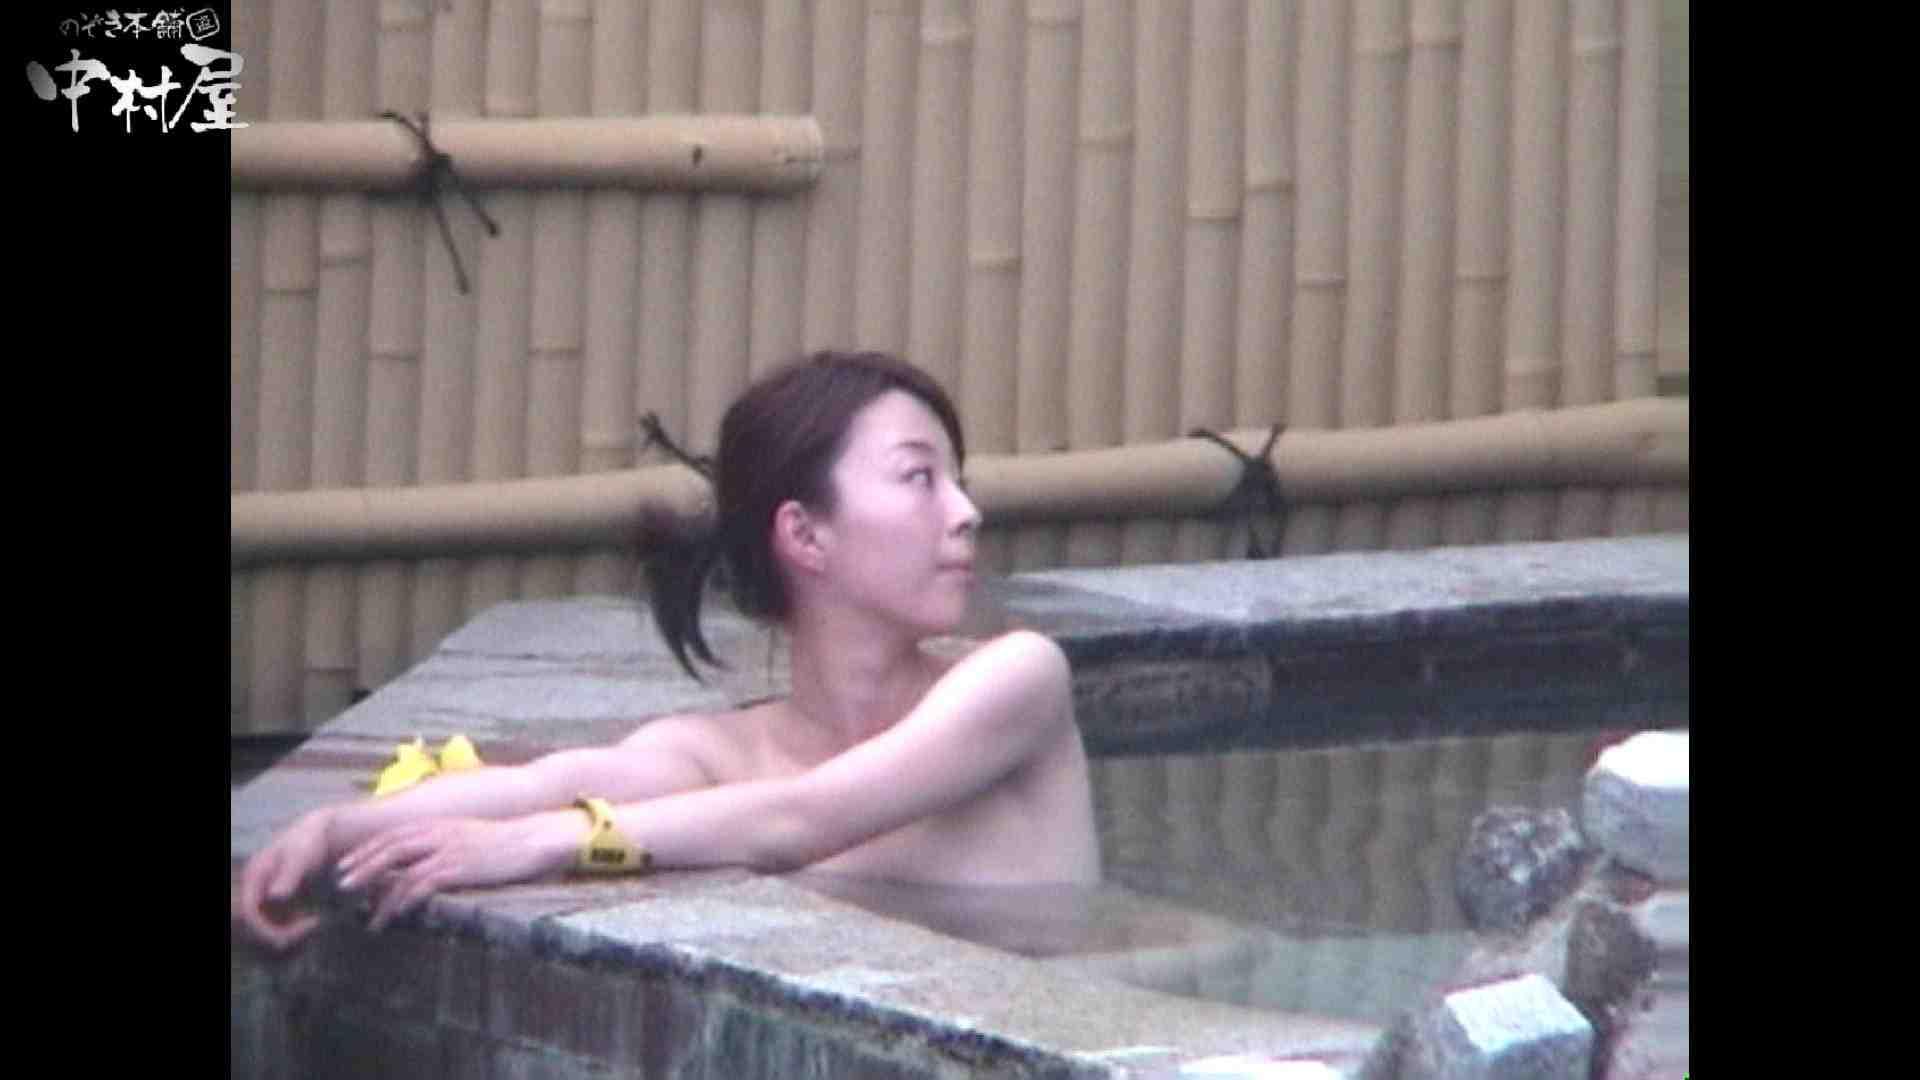 Aquaな露天風呂Vol.964 露天 | OLのプライベート  12pic 7